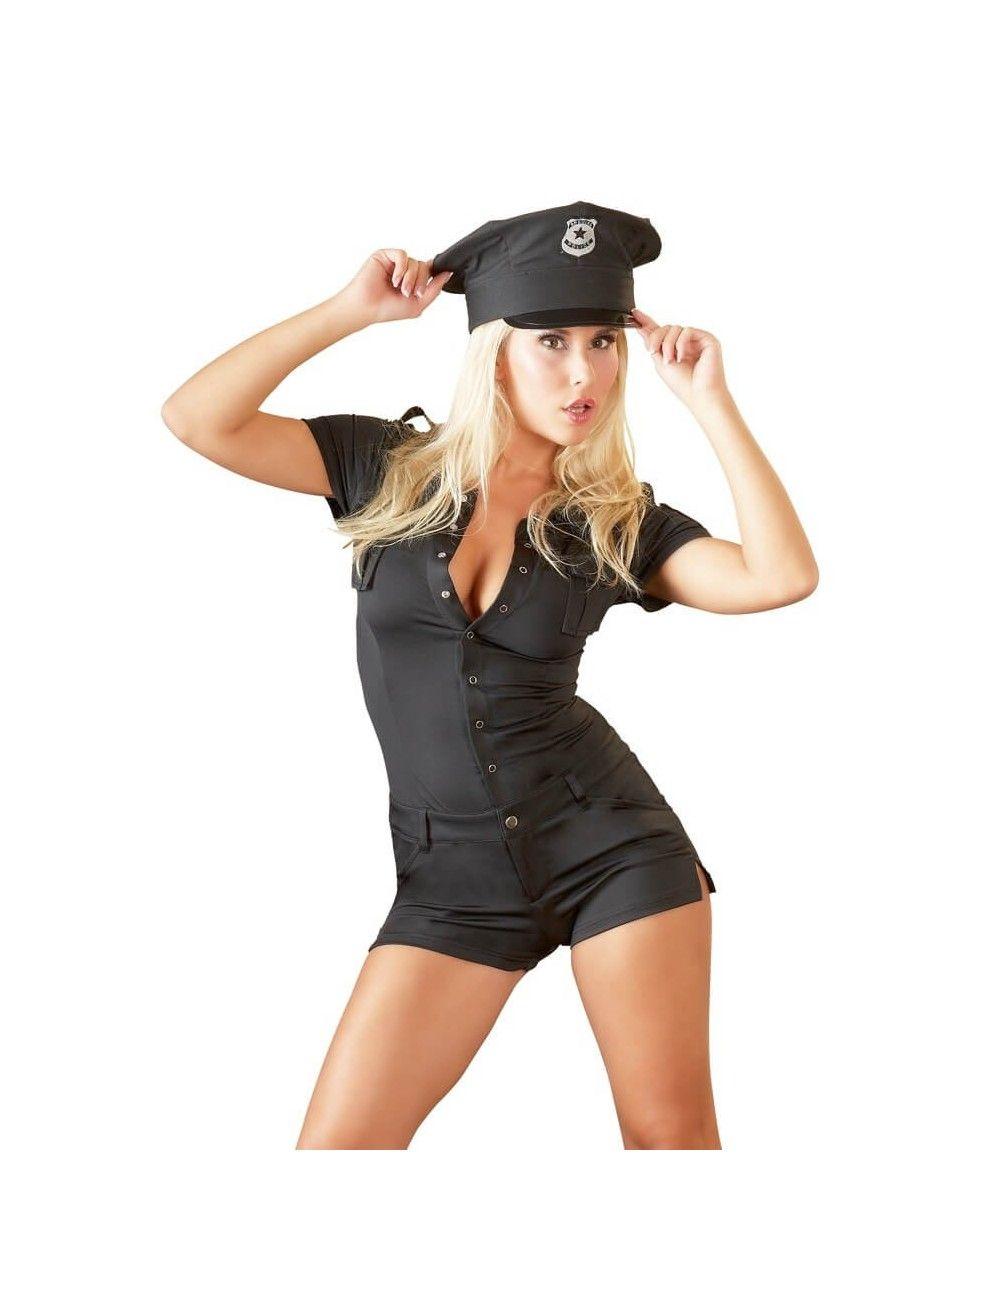 Combishort Officier de Police Cottelli Collection